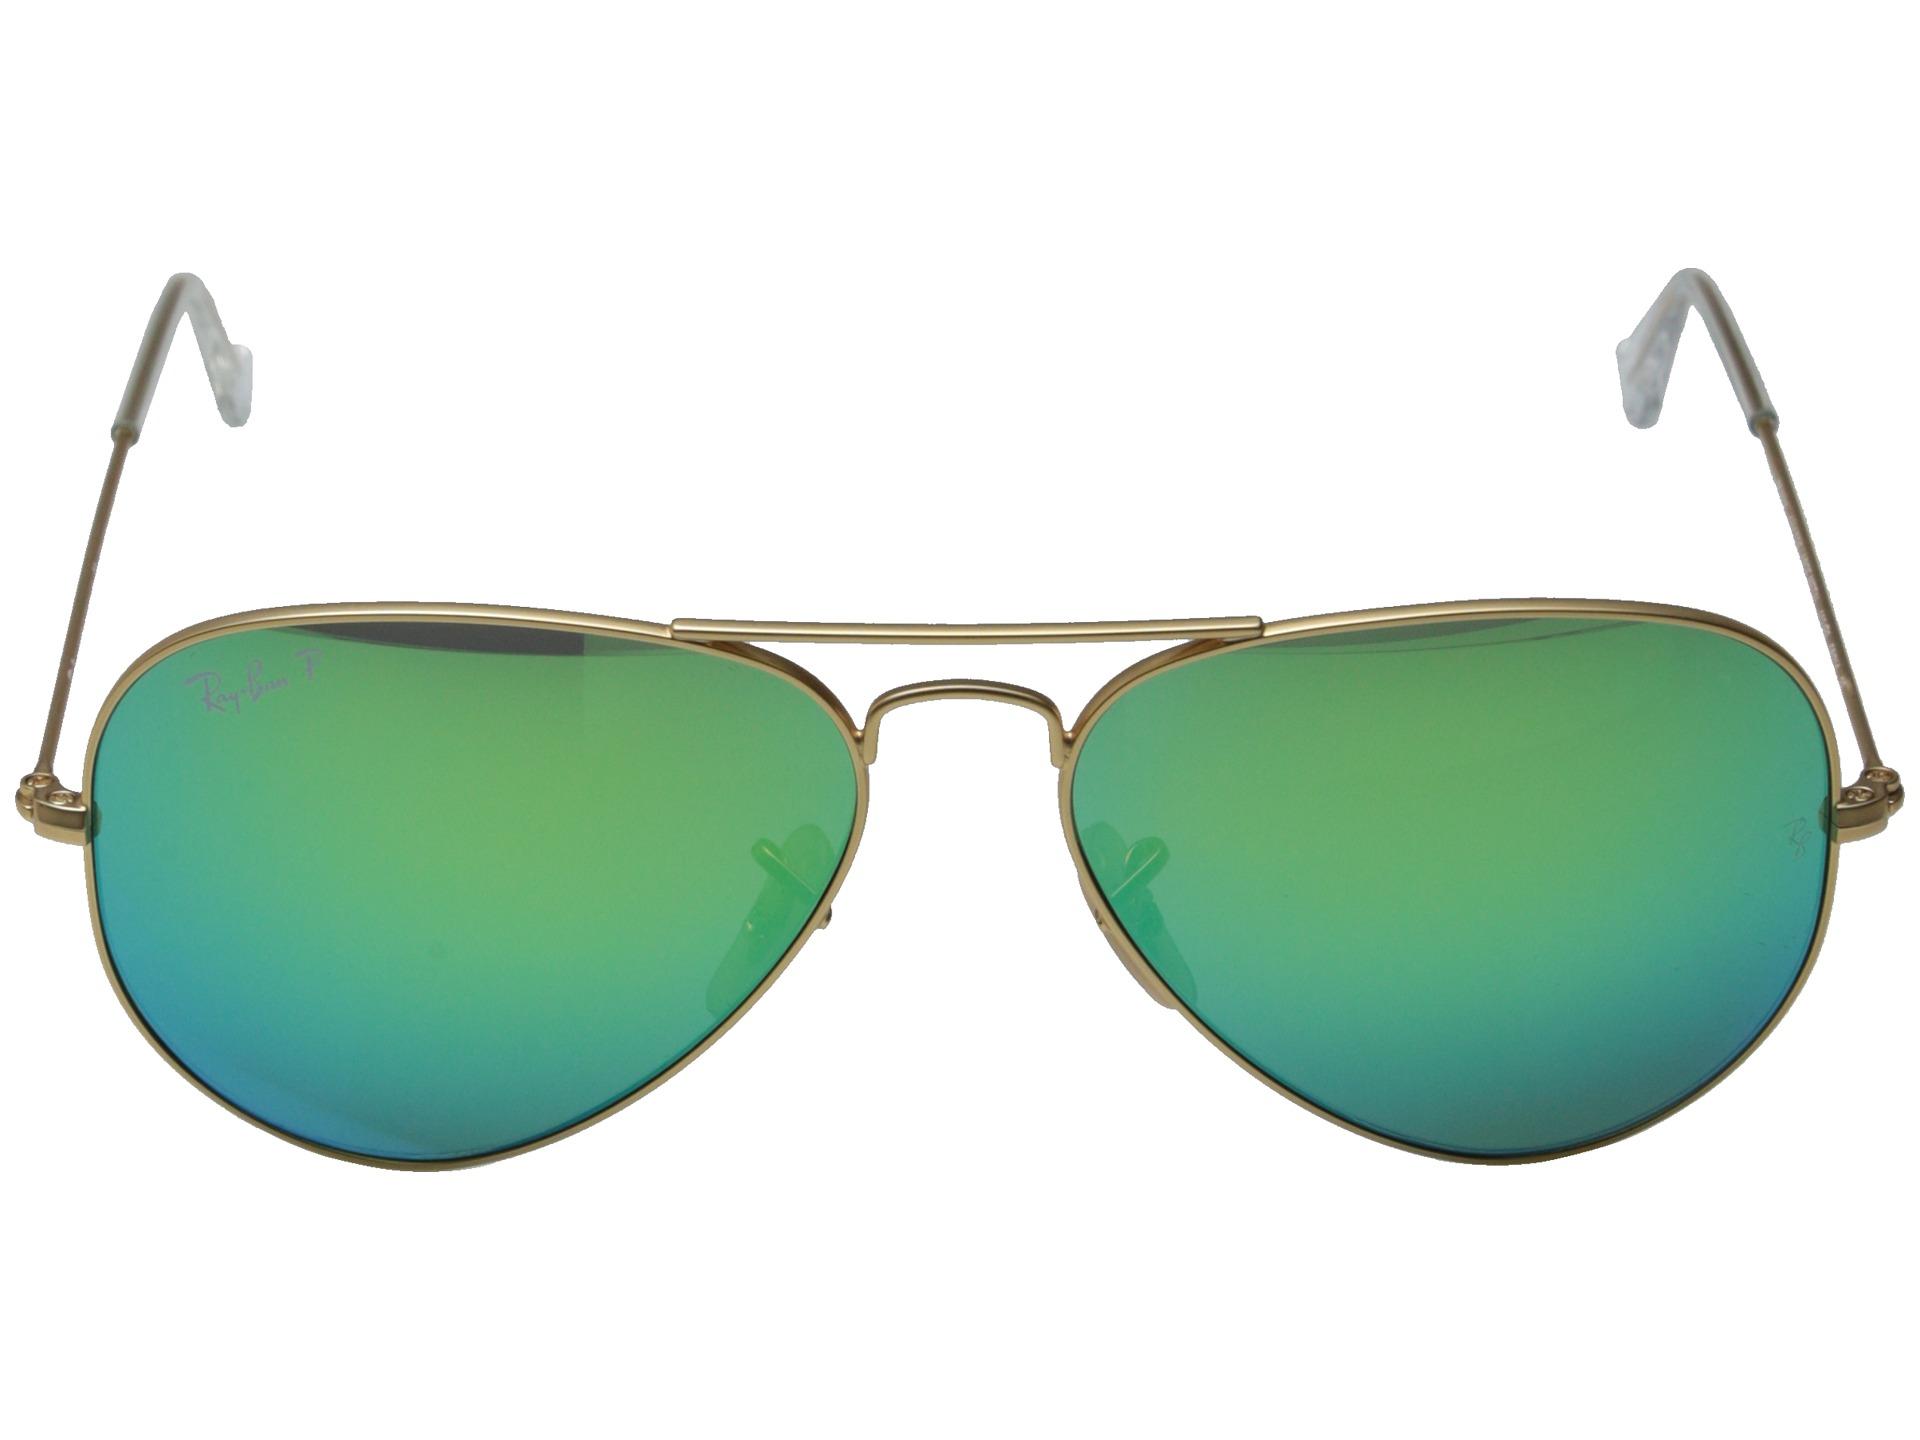 81277c86a5f Ray Ban Color Aviator Sunglasses 58mm X 25mm « Heritage Malta